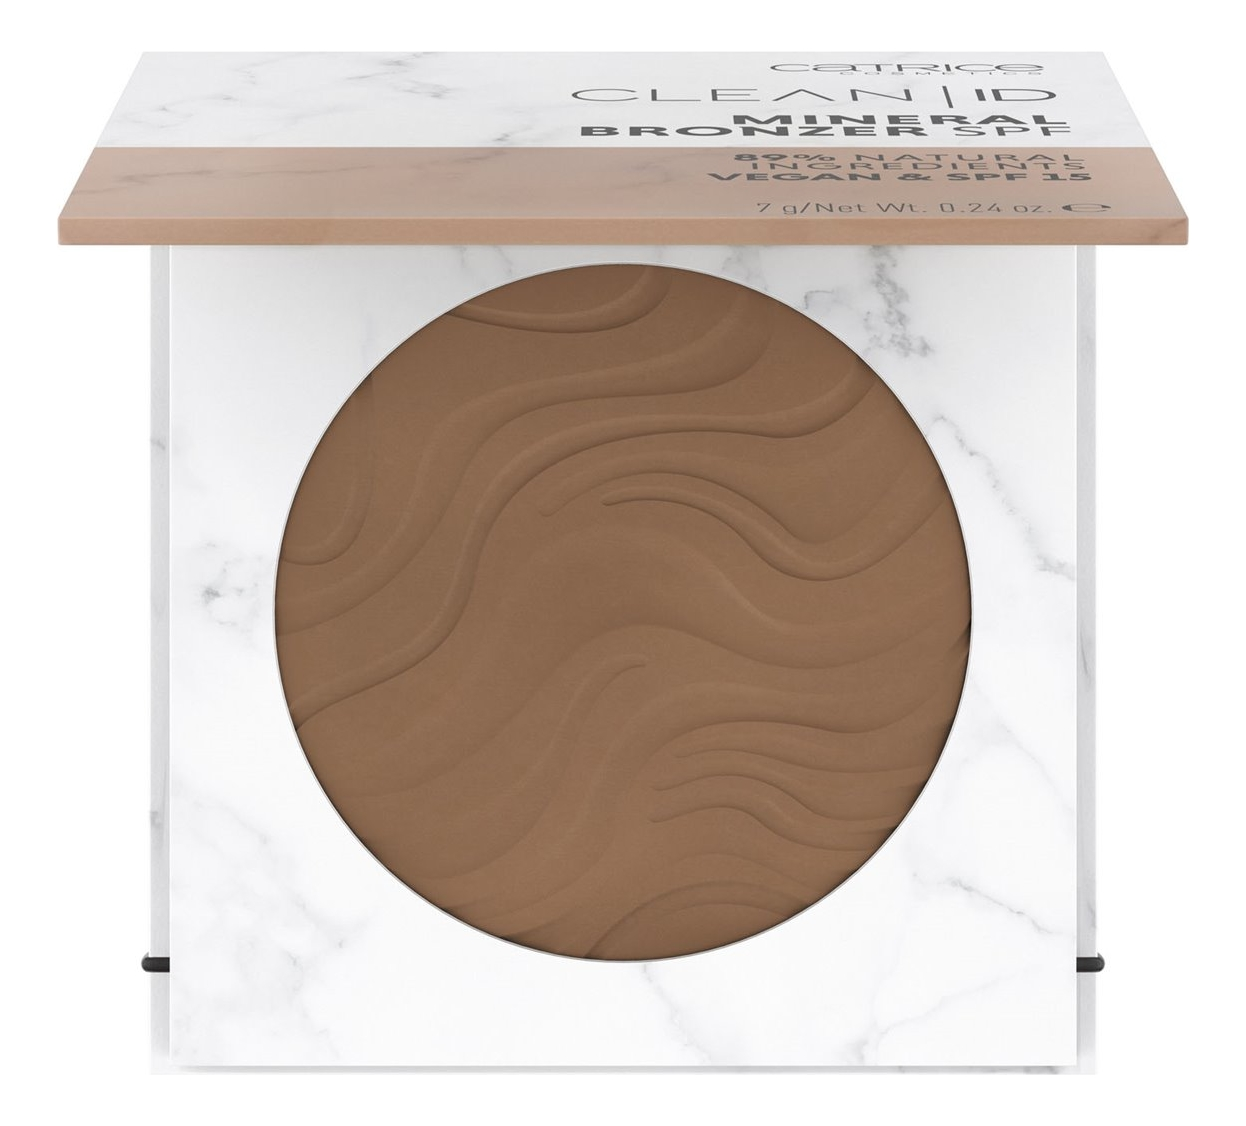 Бронзер для лица Clean ID Mineral Bronzer SPF15 7г: 020 Medium - Dark недорого